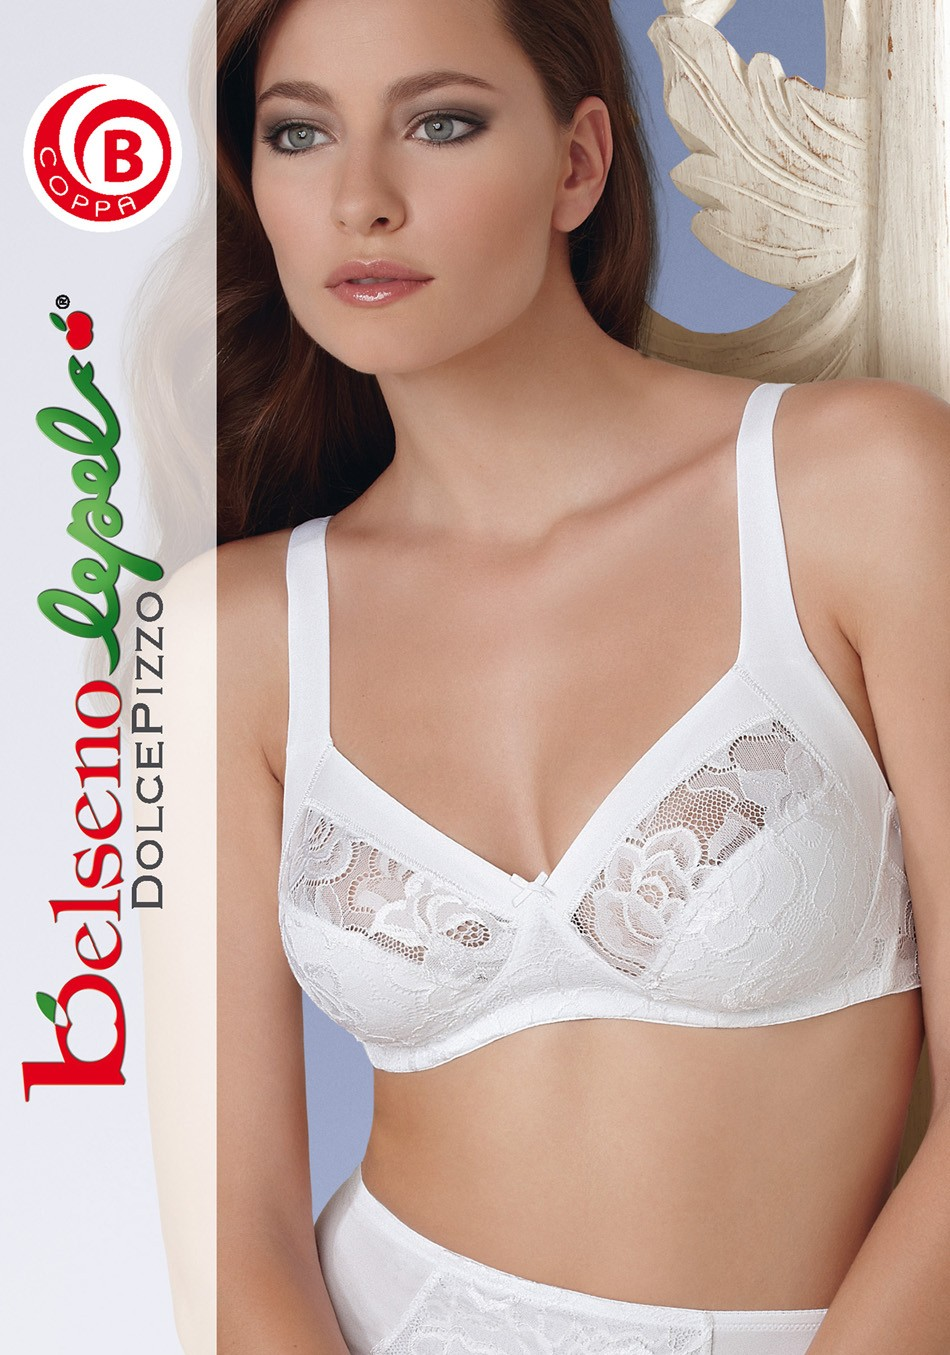 Unwired stretch lace bra - Lepel Belseno art.230